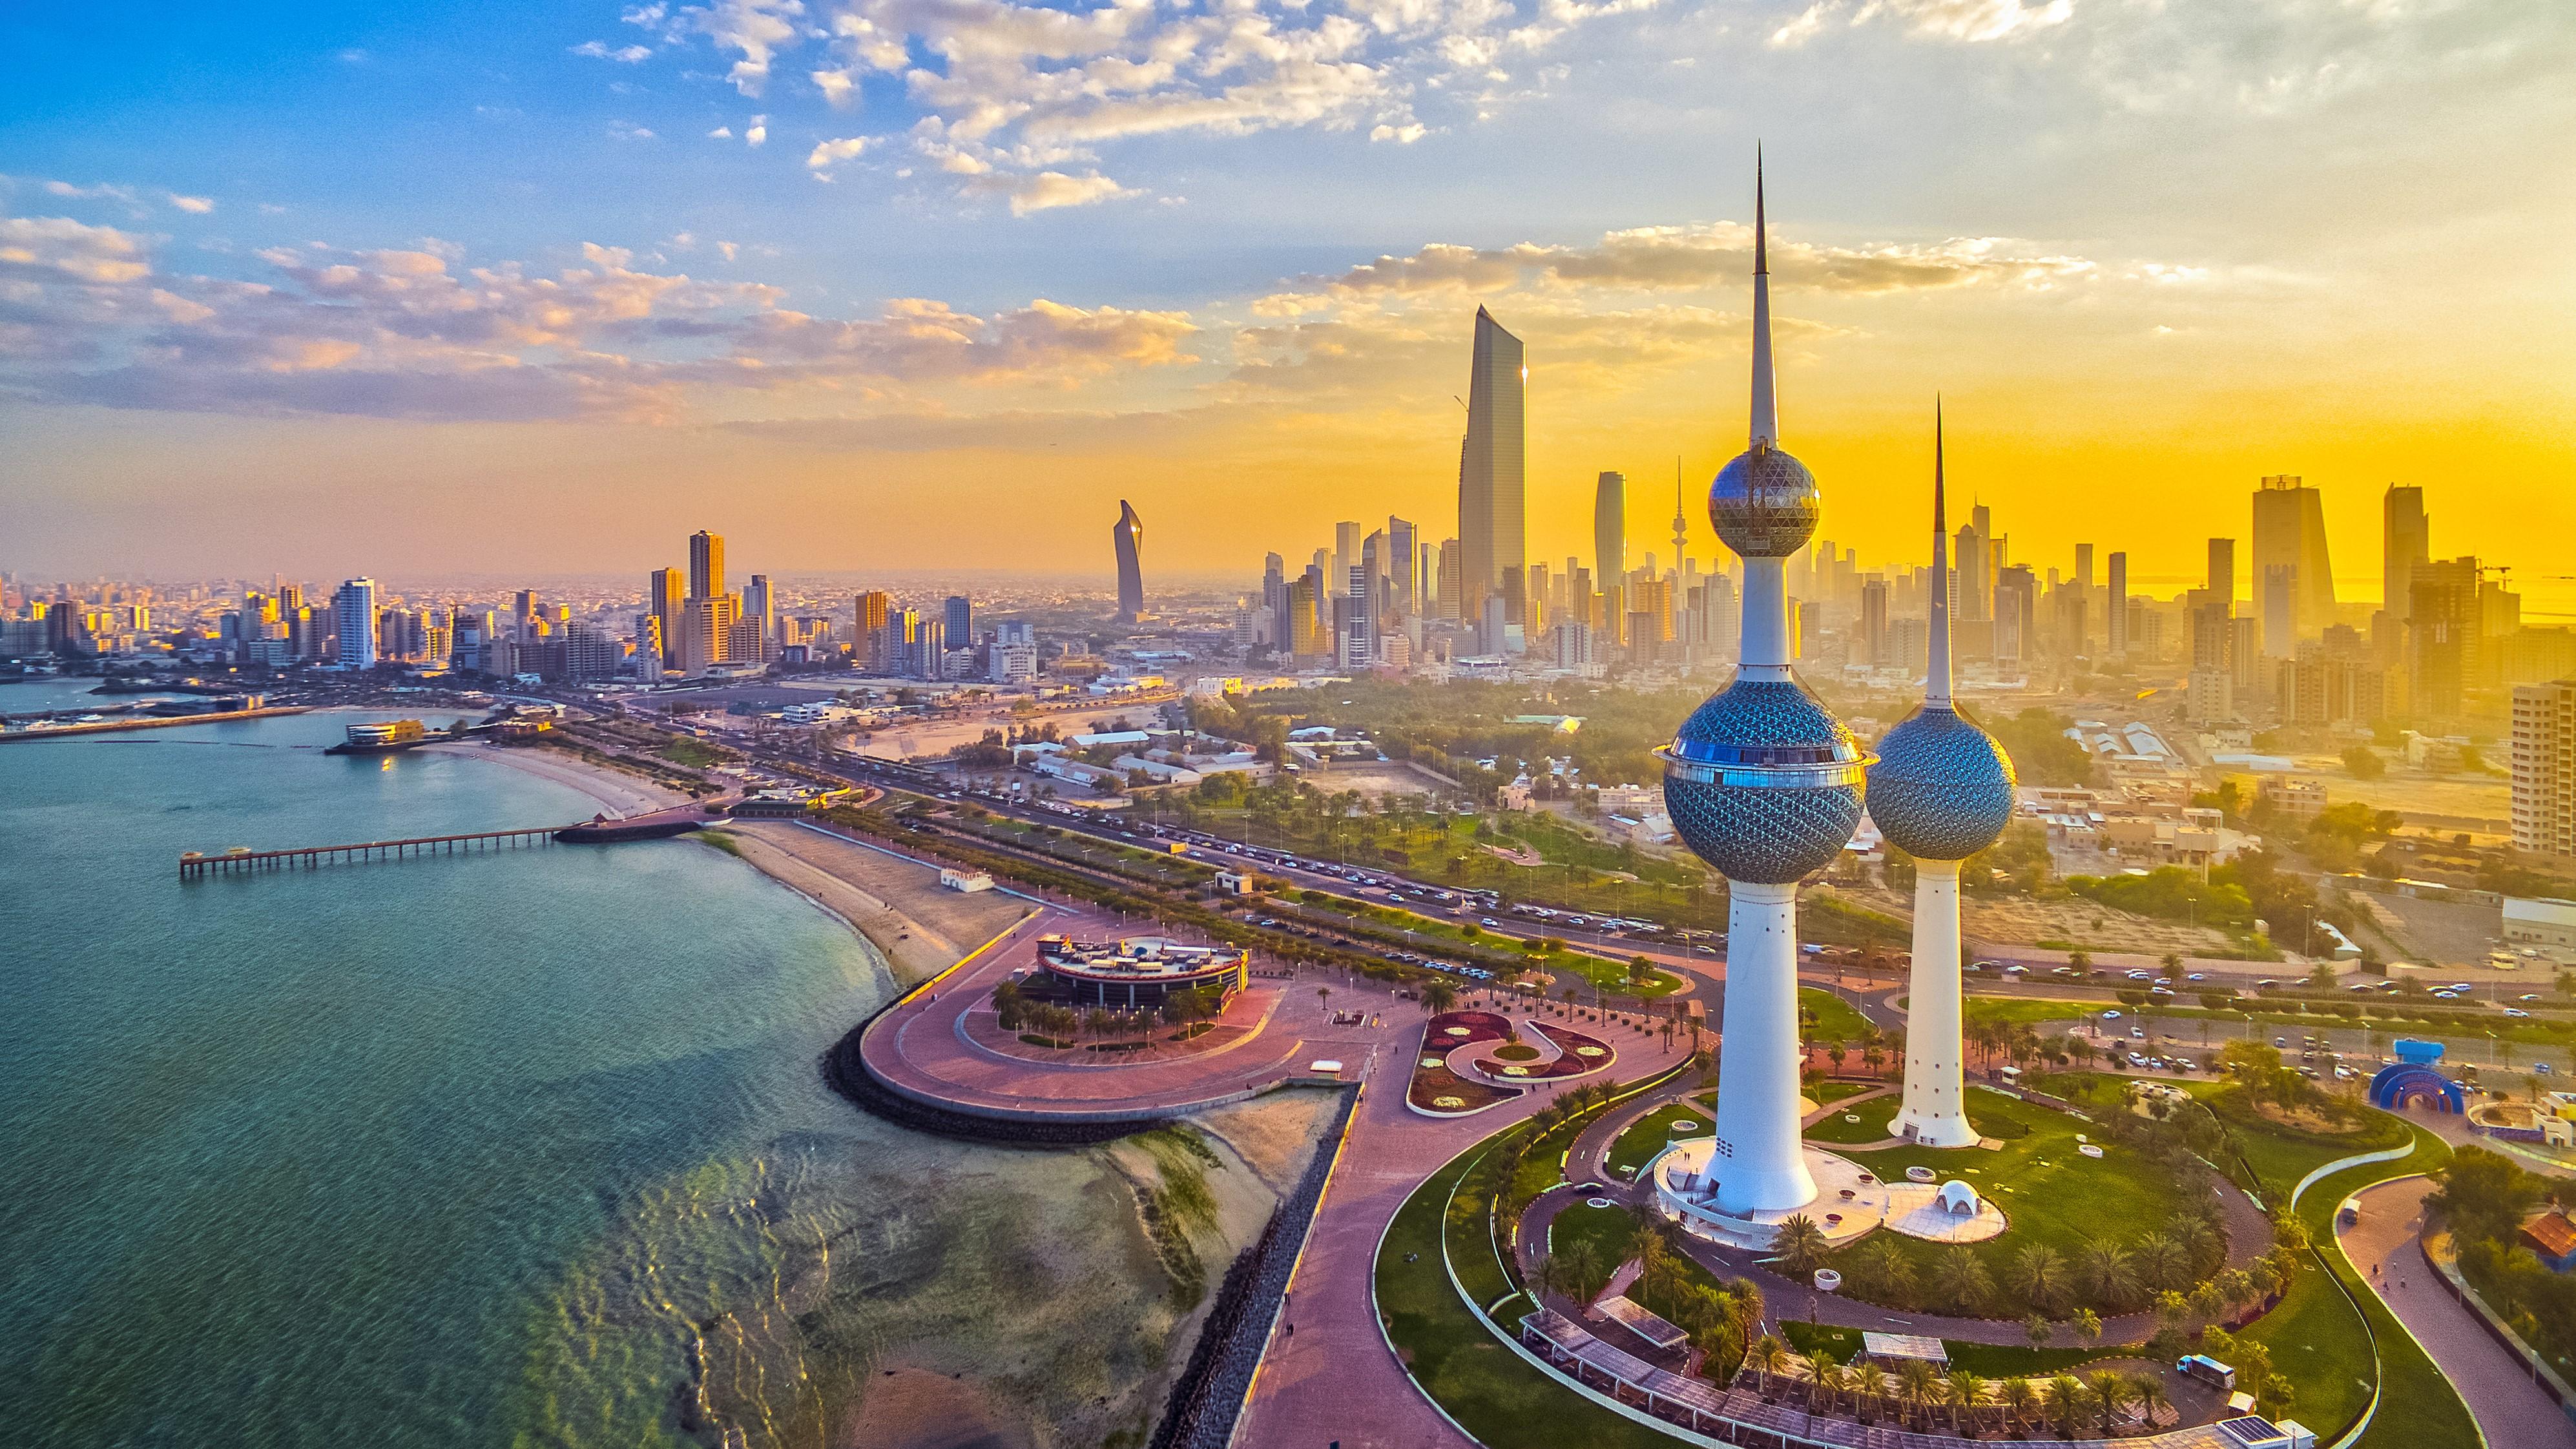 Detroit to Kuwait City $581 RT Airfares on Lufthansa (Travel Sept-Dec 2020)